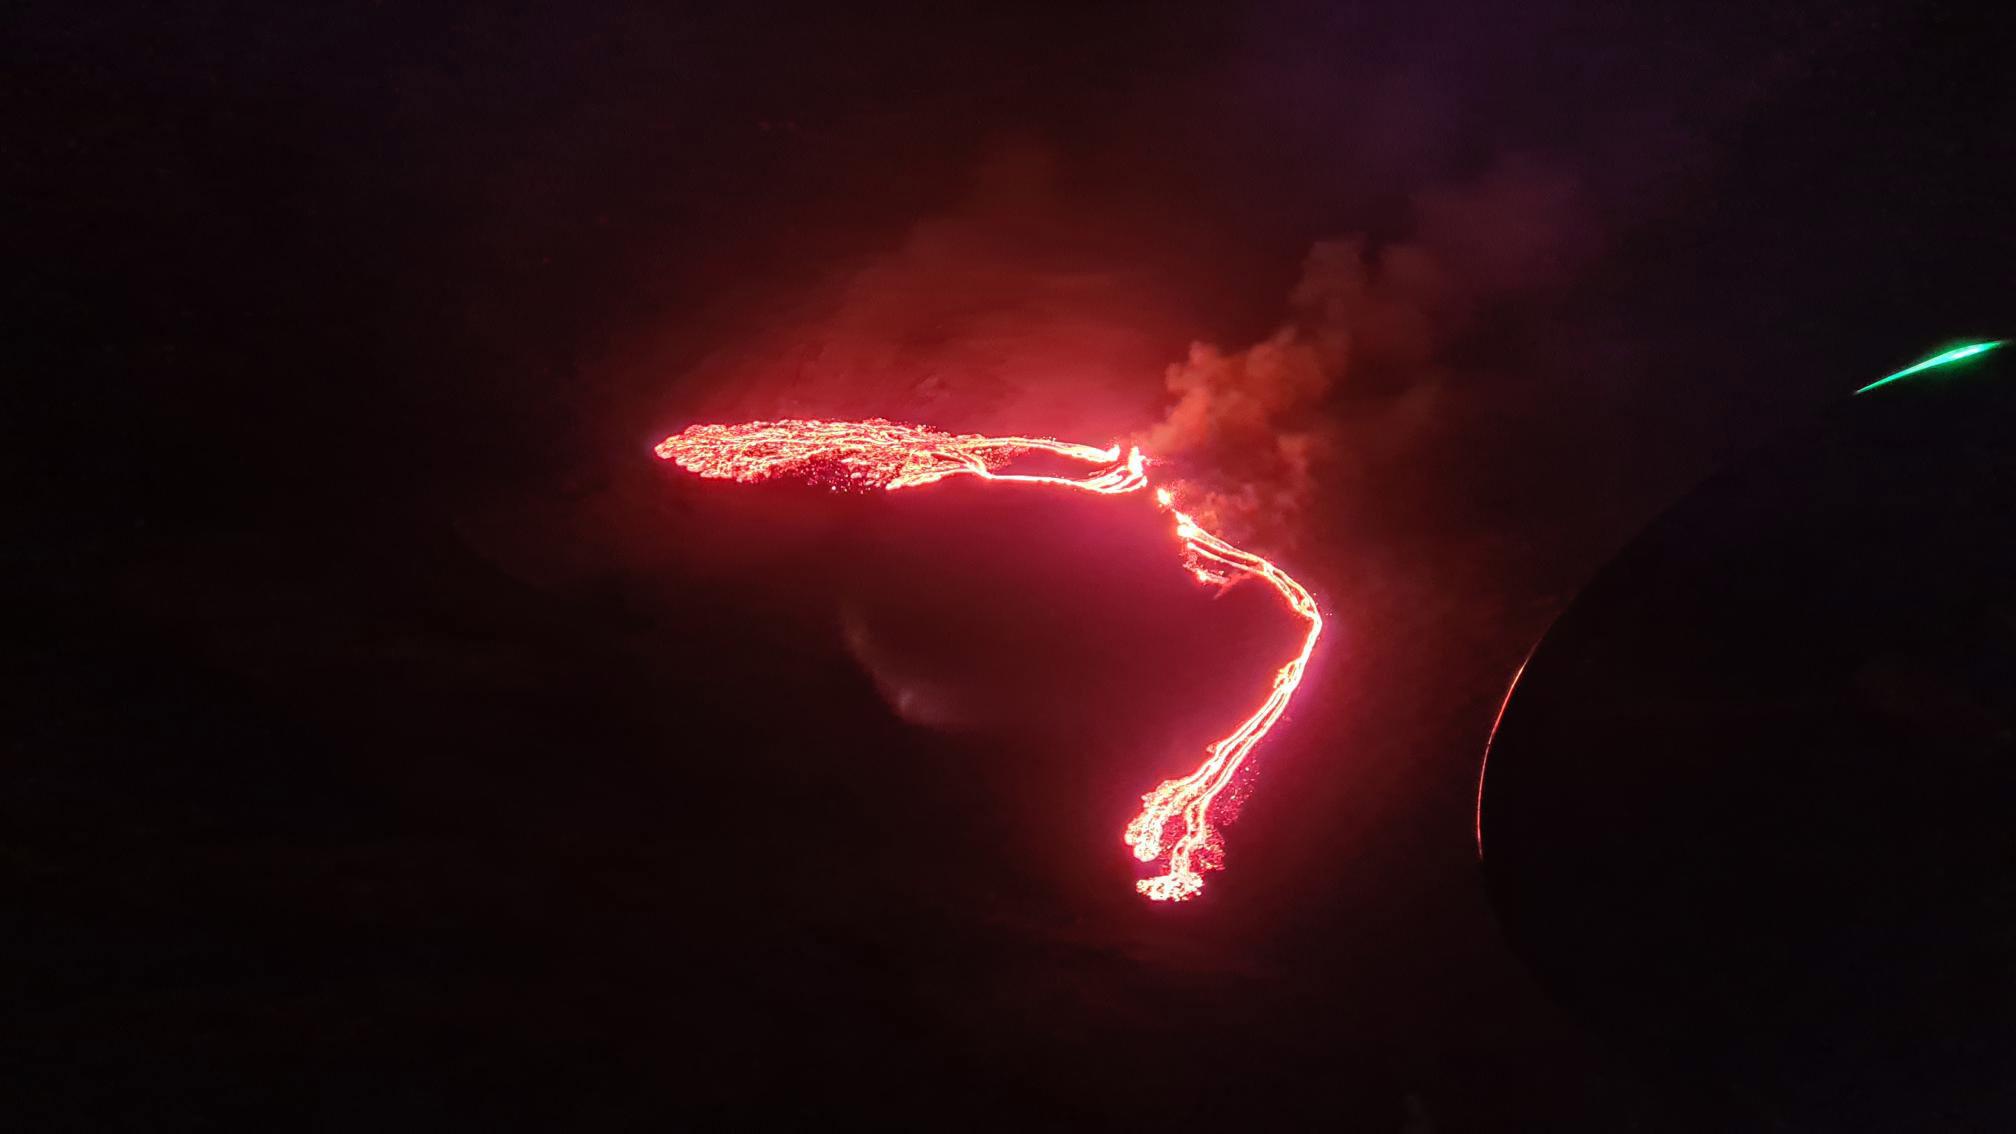 Iceland volcano remains hazardous after eruption near Reykjavík